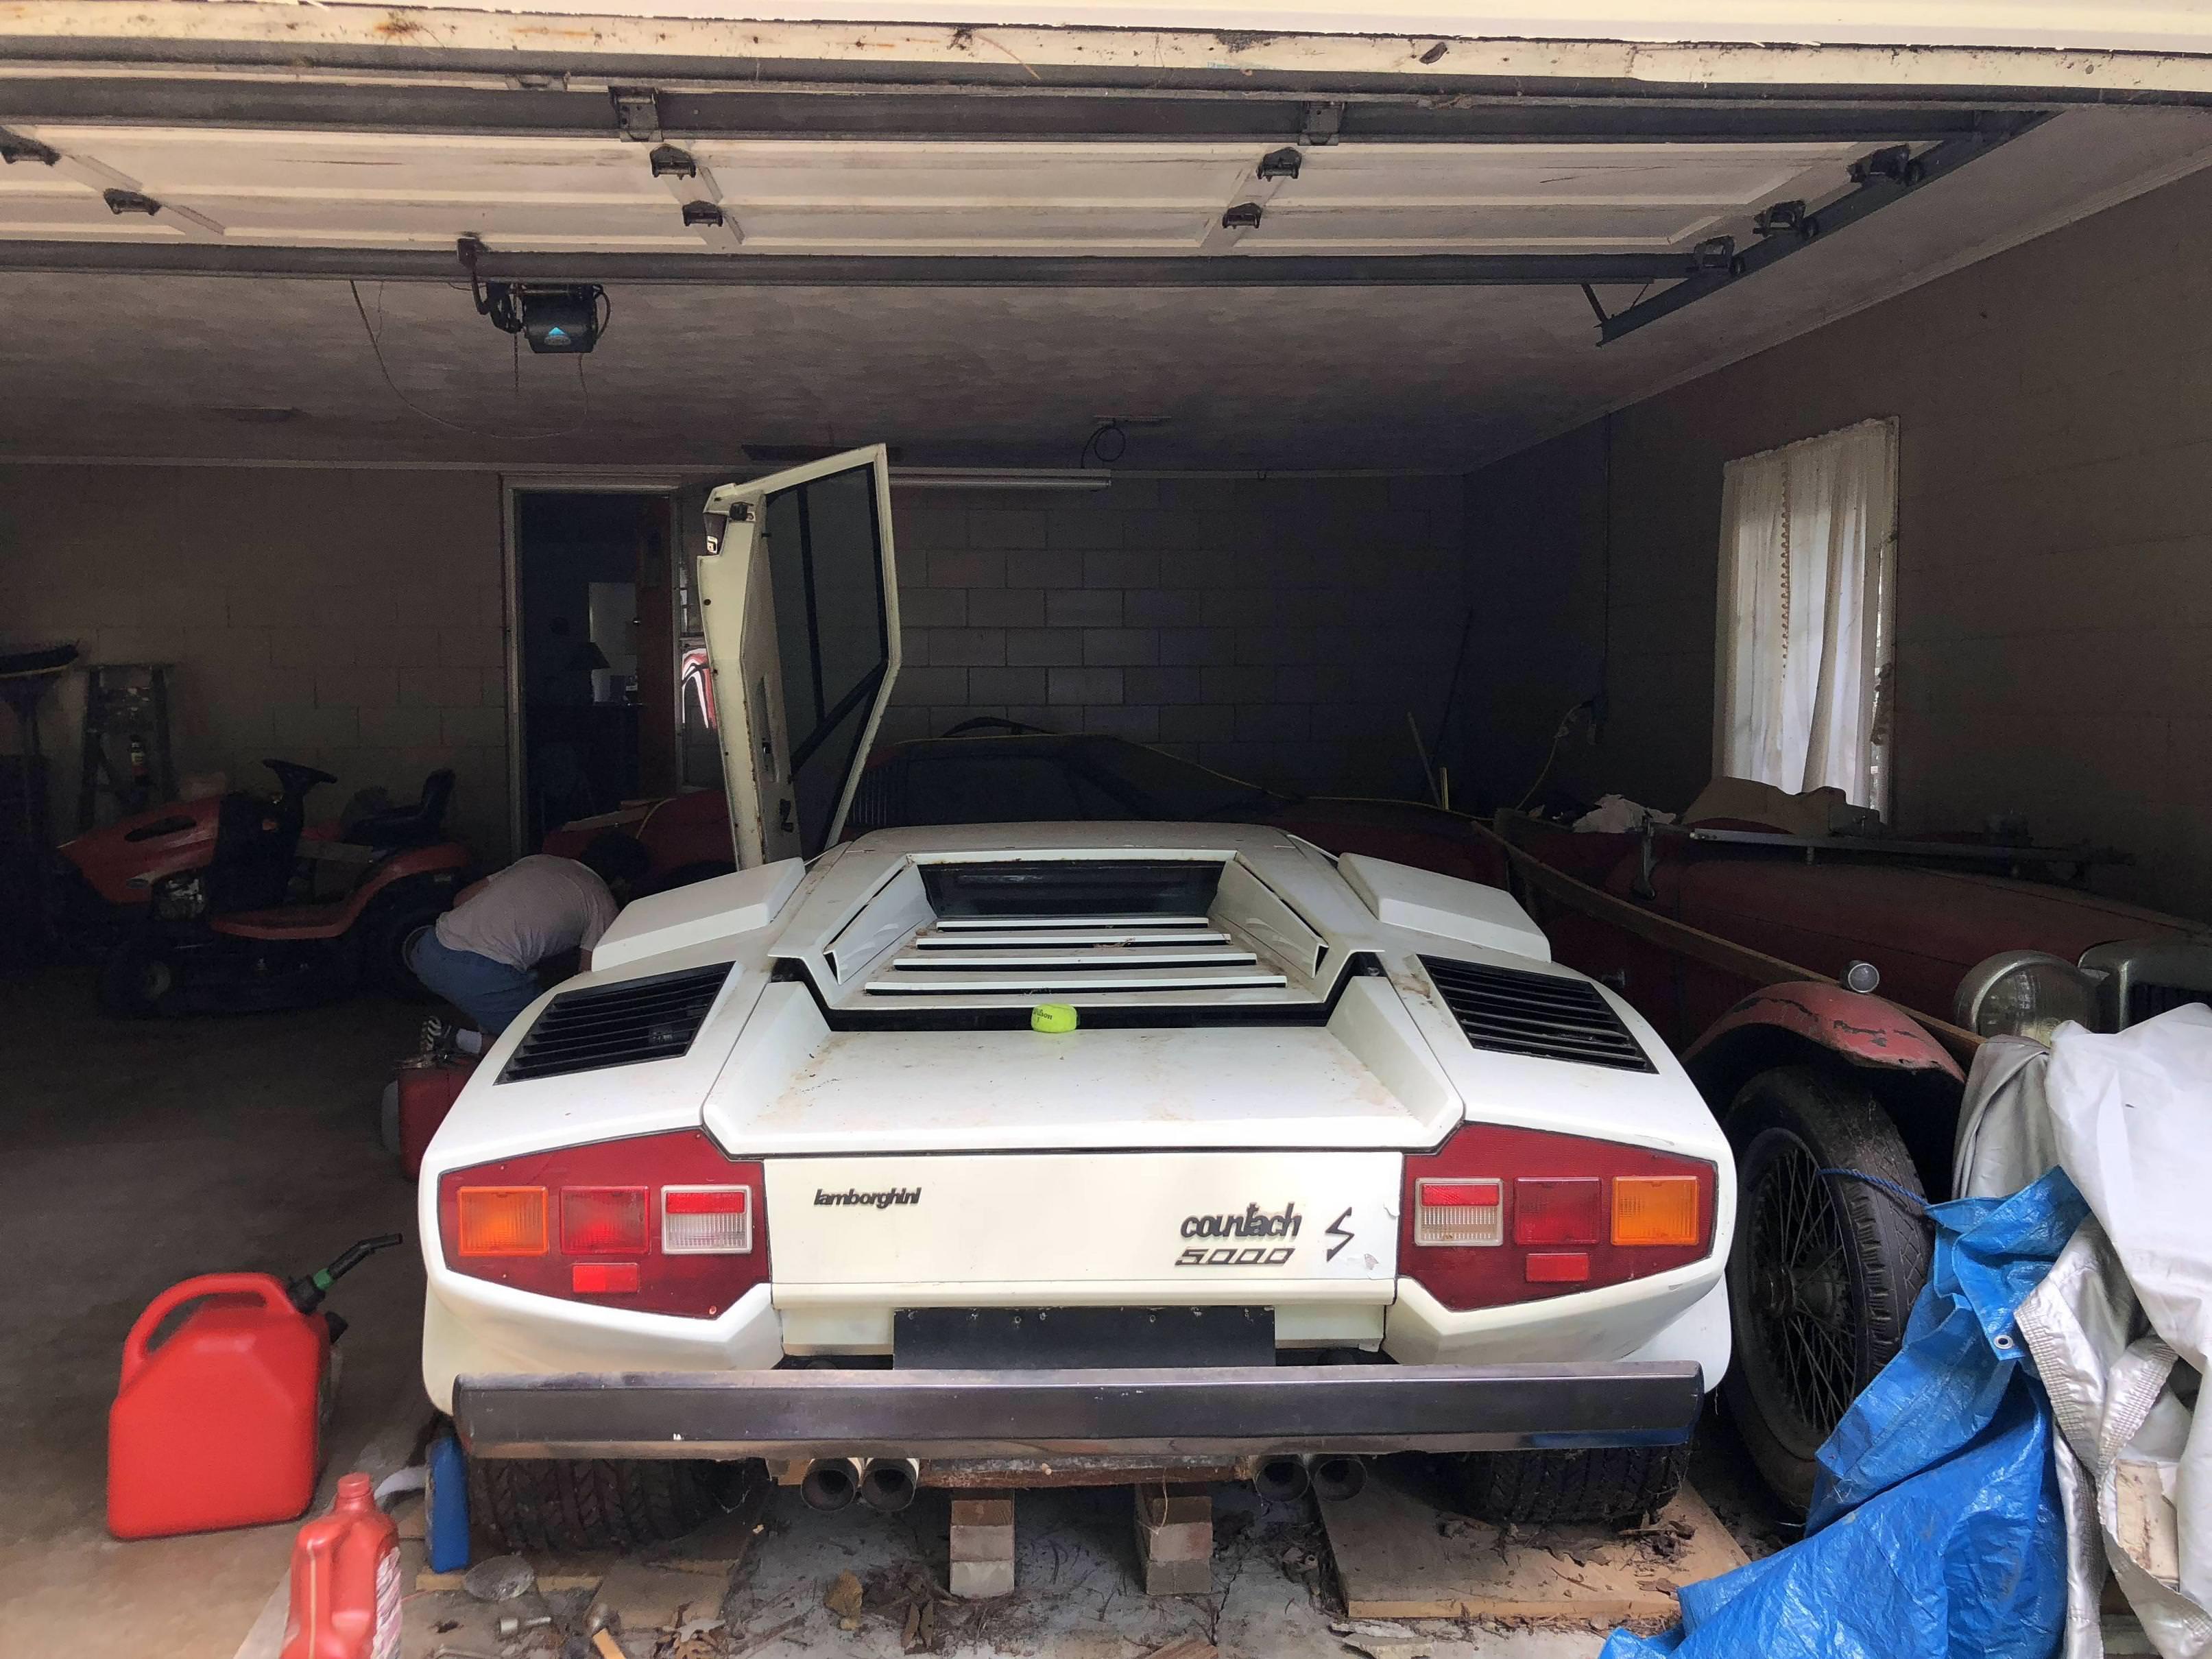 Lamborghini Countach and Ferrari 308 barnfind 4